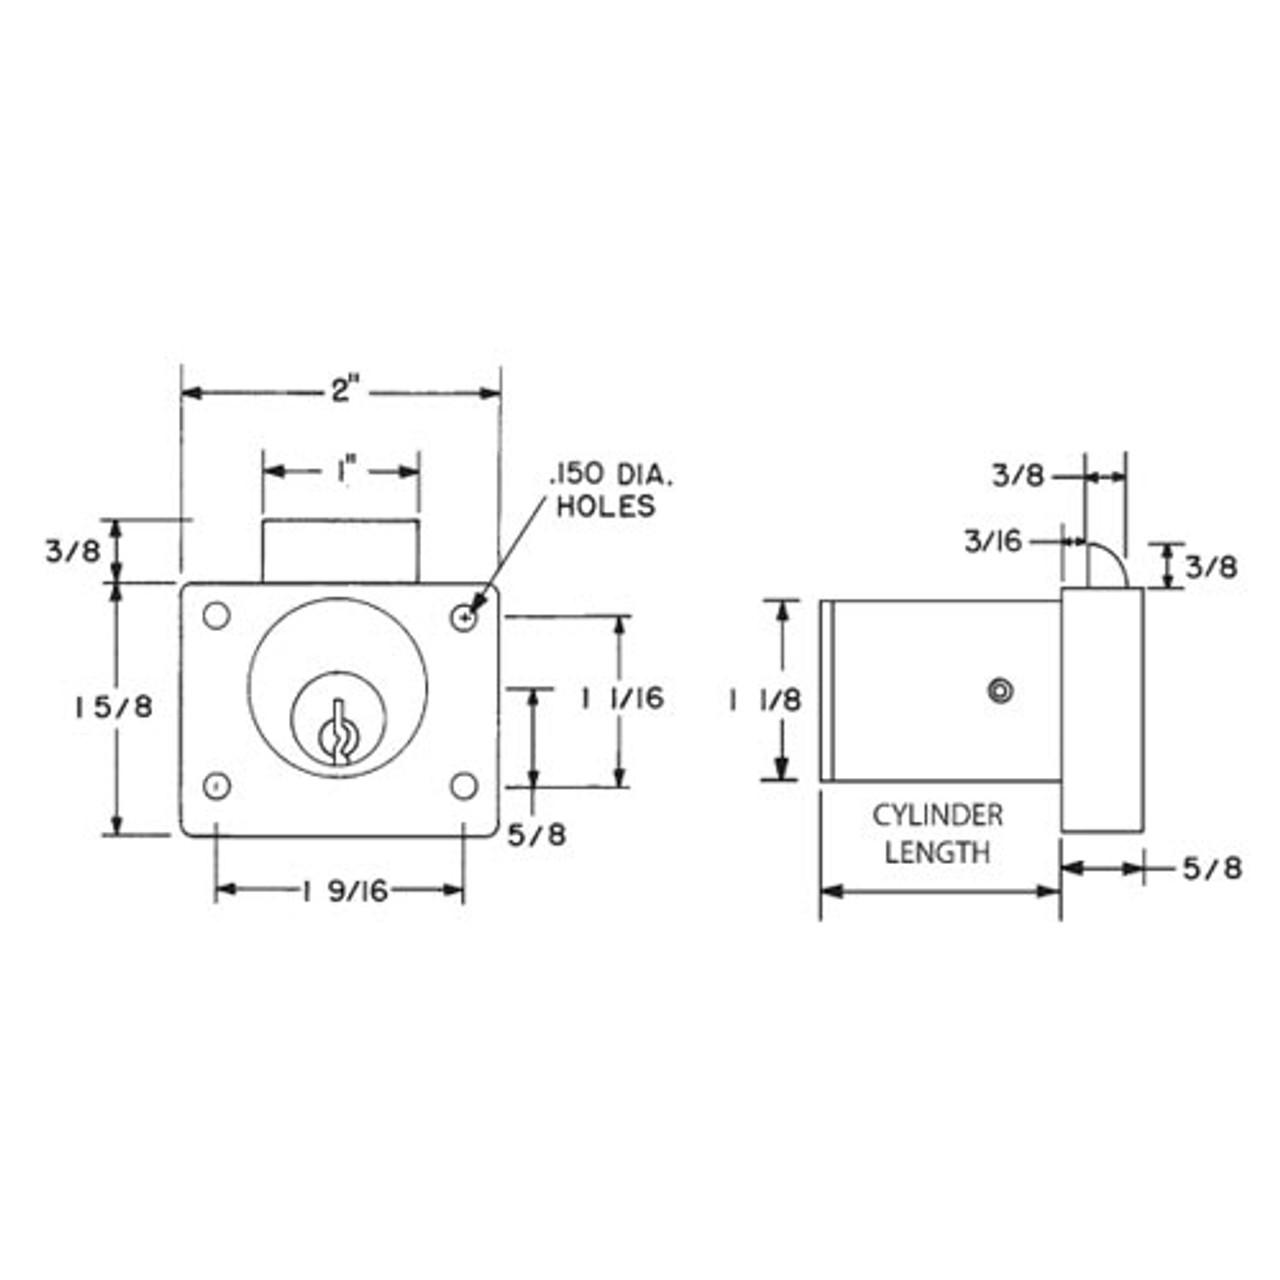 Olympus L78V-VH-KA101-26D-1-3/8 Vertical Handing Drawer Latch Cabinet Lock in Satin Chrome